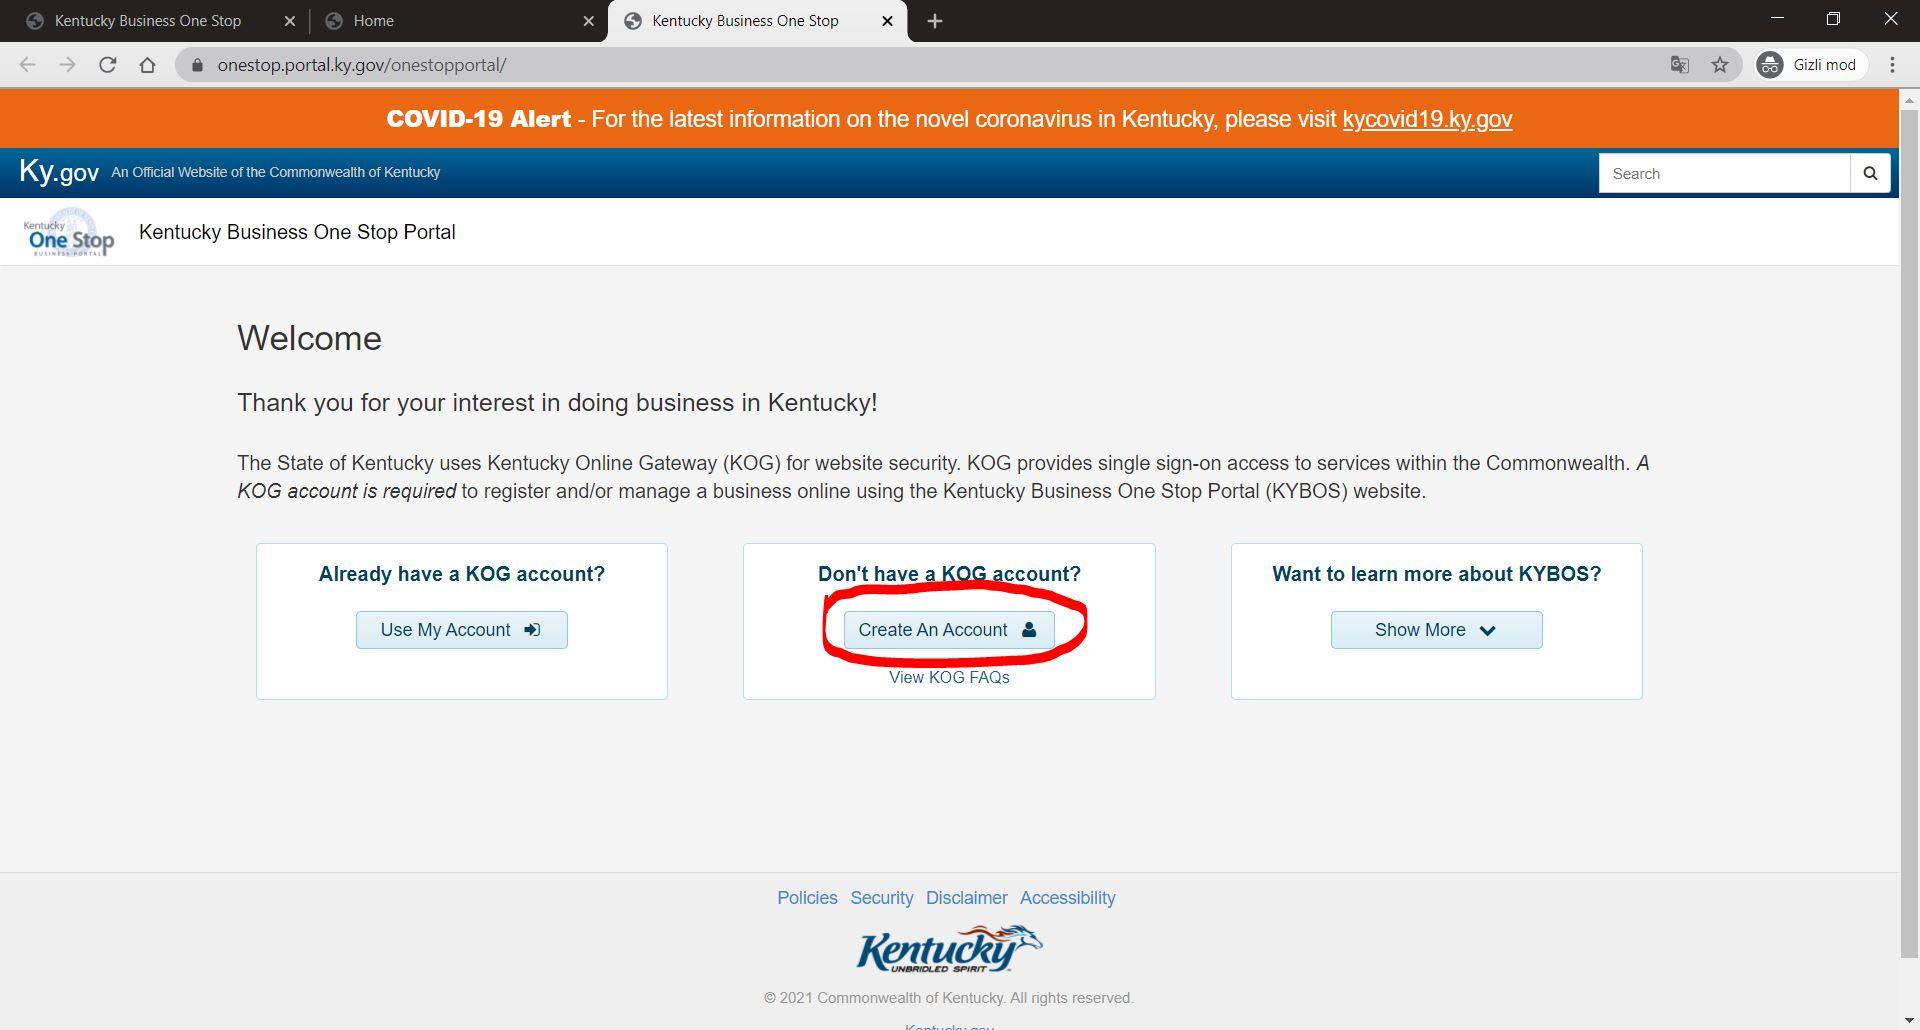 kentucky onestop portal 2 Kentucky LLC'yi One Stop Portal'a Kaydedin